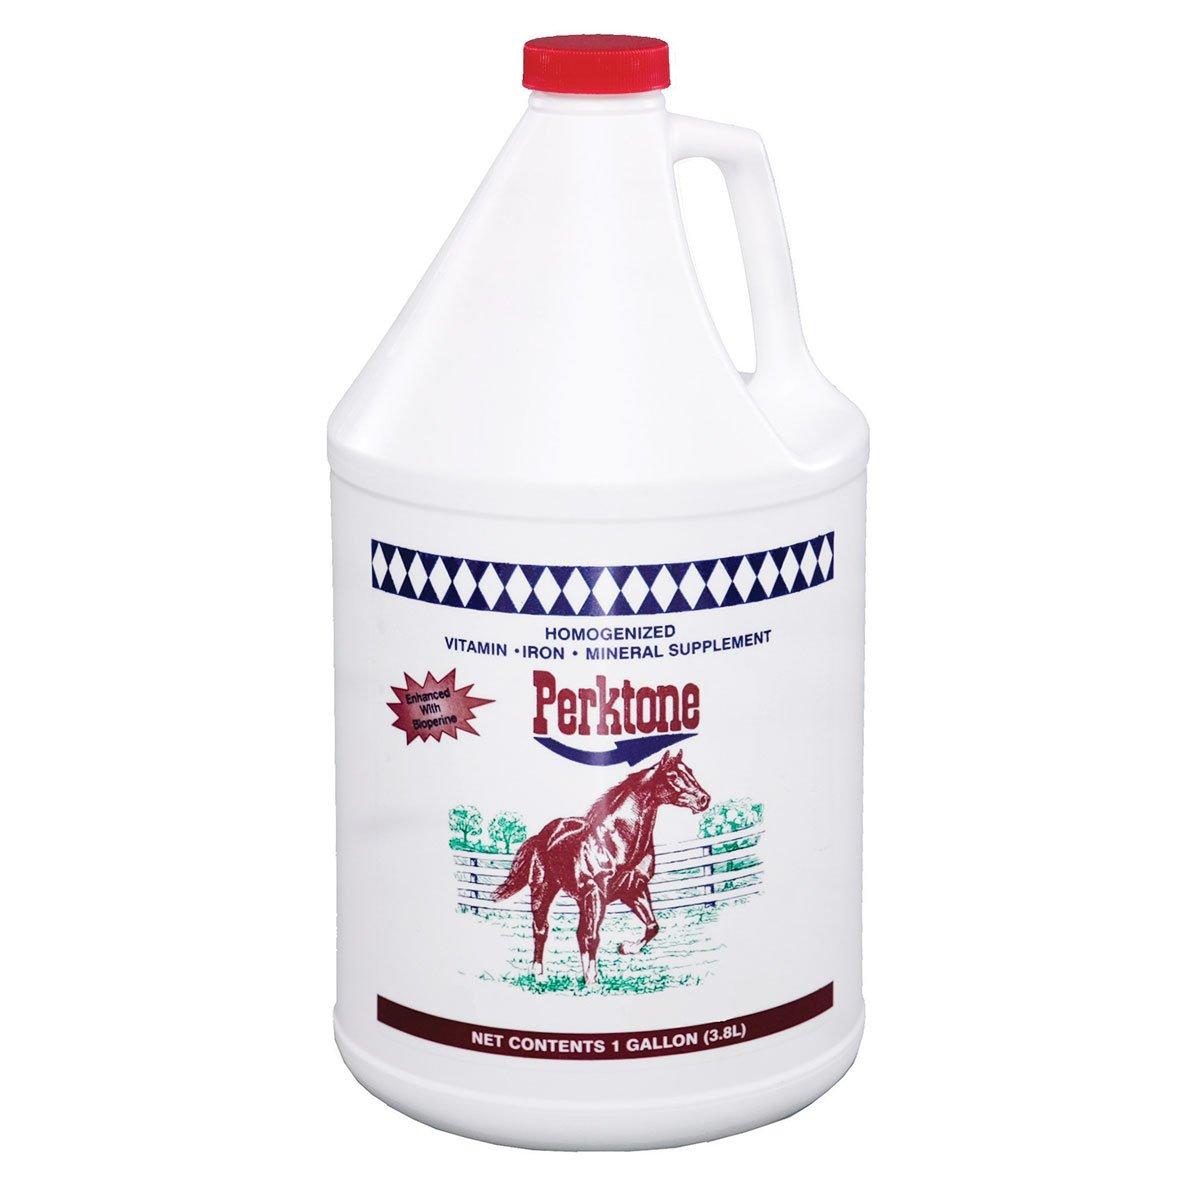 Cox Veterinary Lab Perktone Supplement for Horses